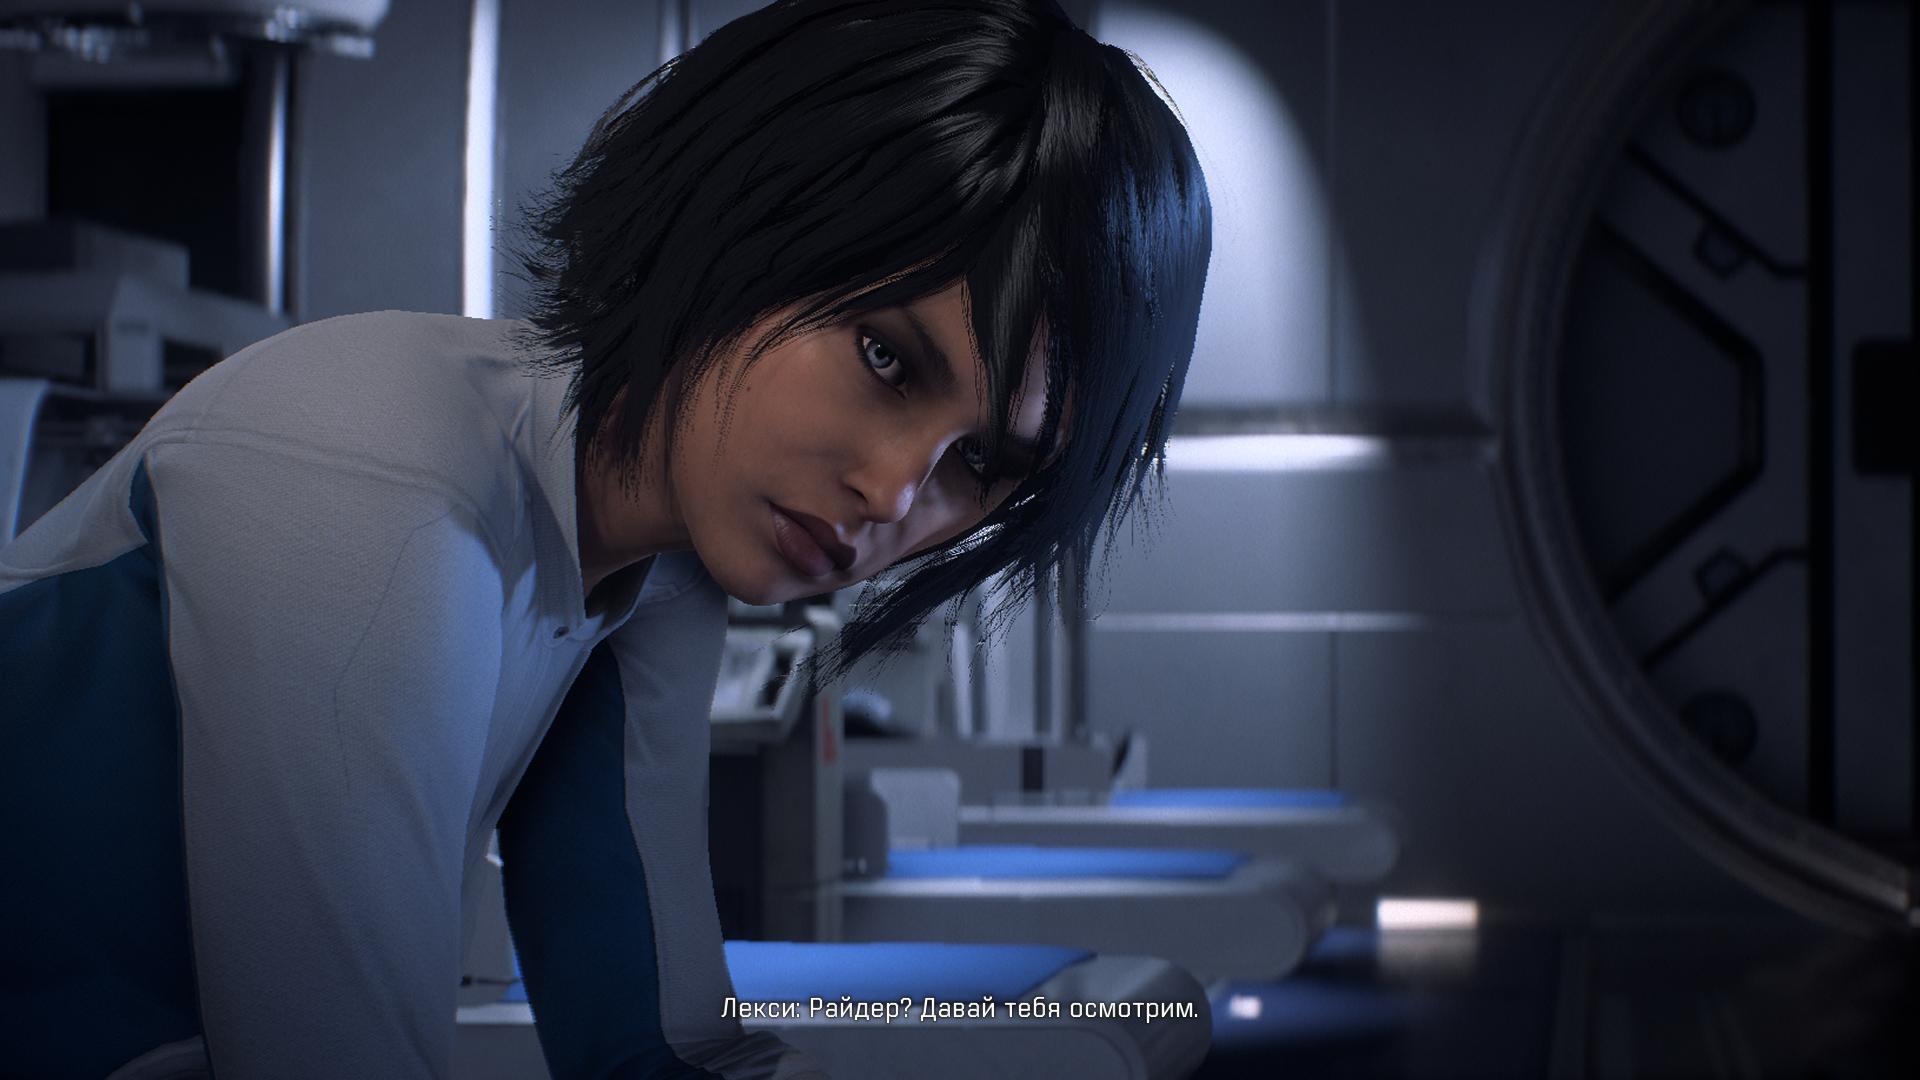 Сара Райдер - Mass Effect: Andromeda Лицо, Персонаж